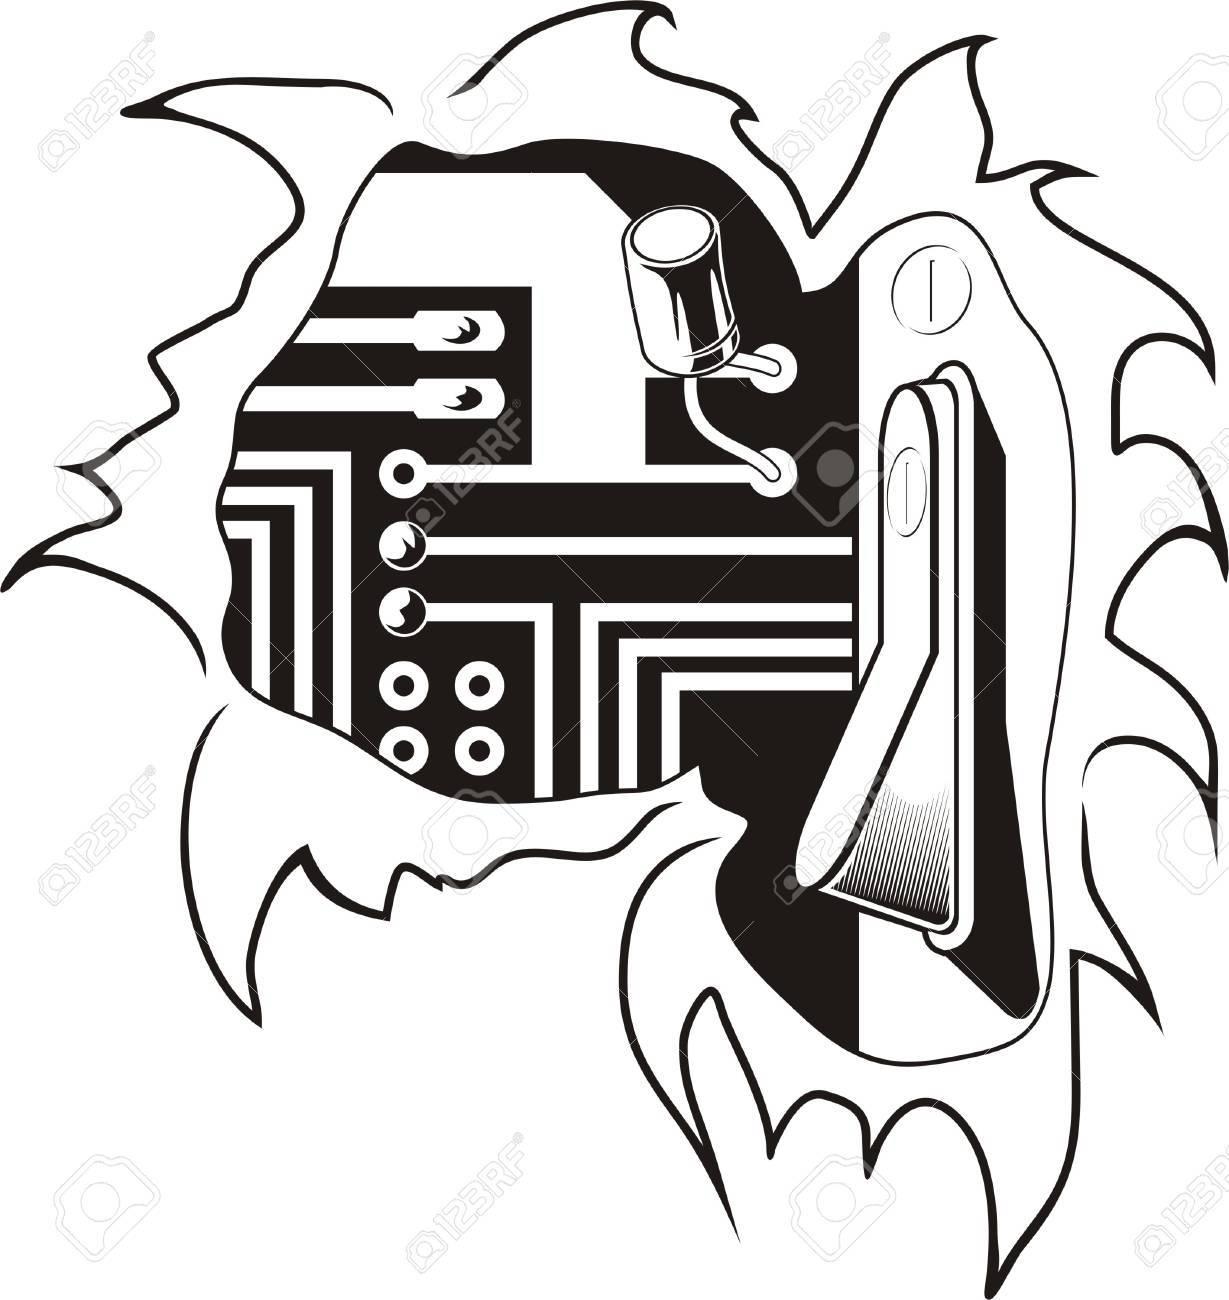 Biomechanics. Ready for vinyl cutting. Stock Vector - 7932390